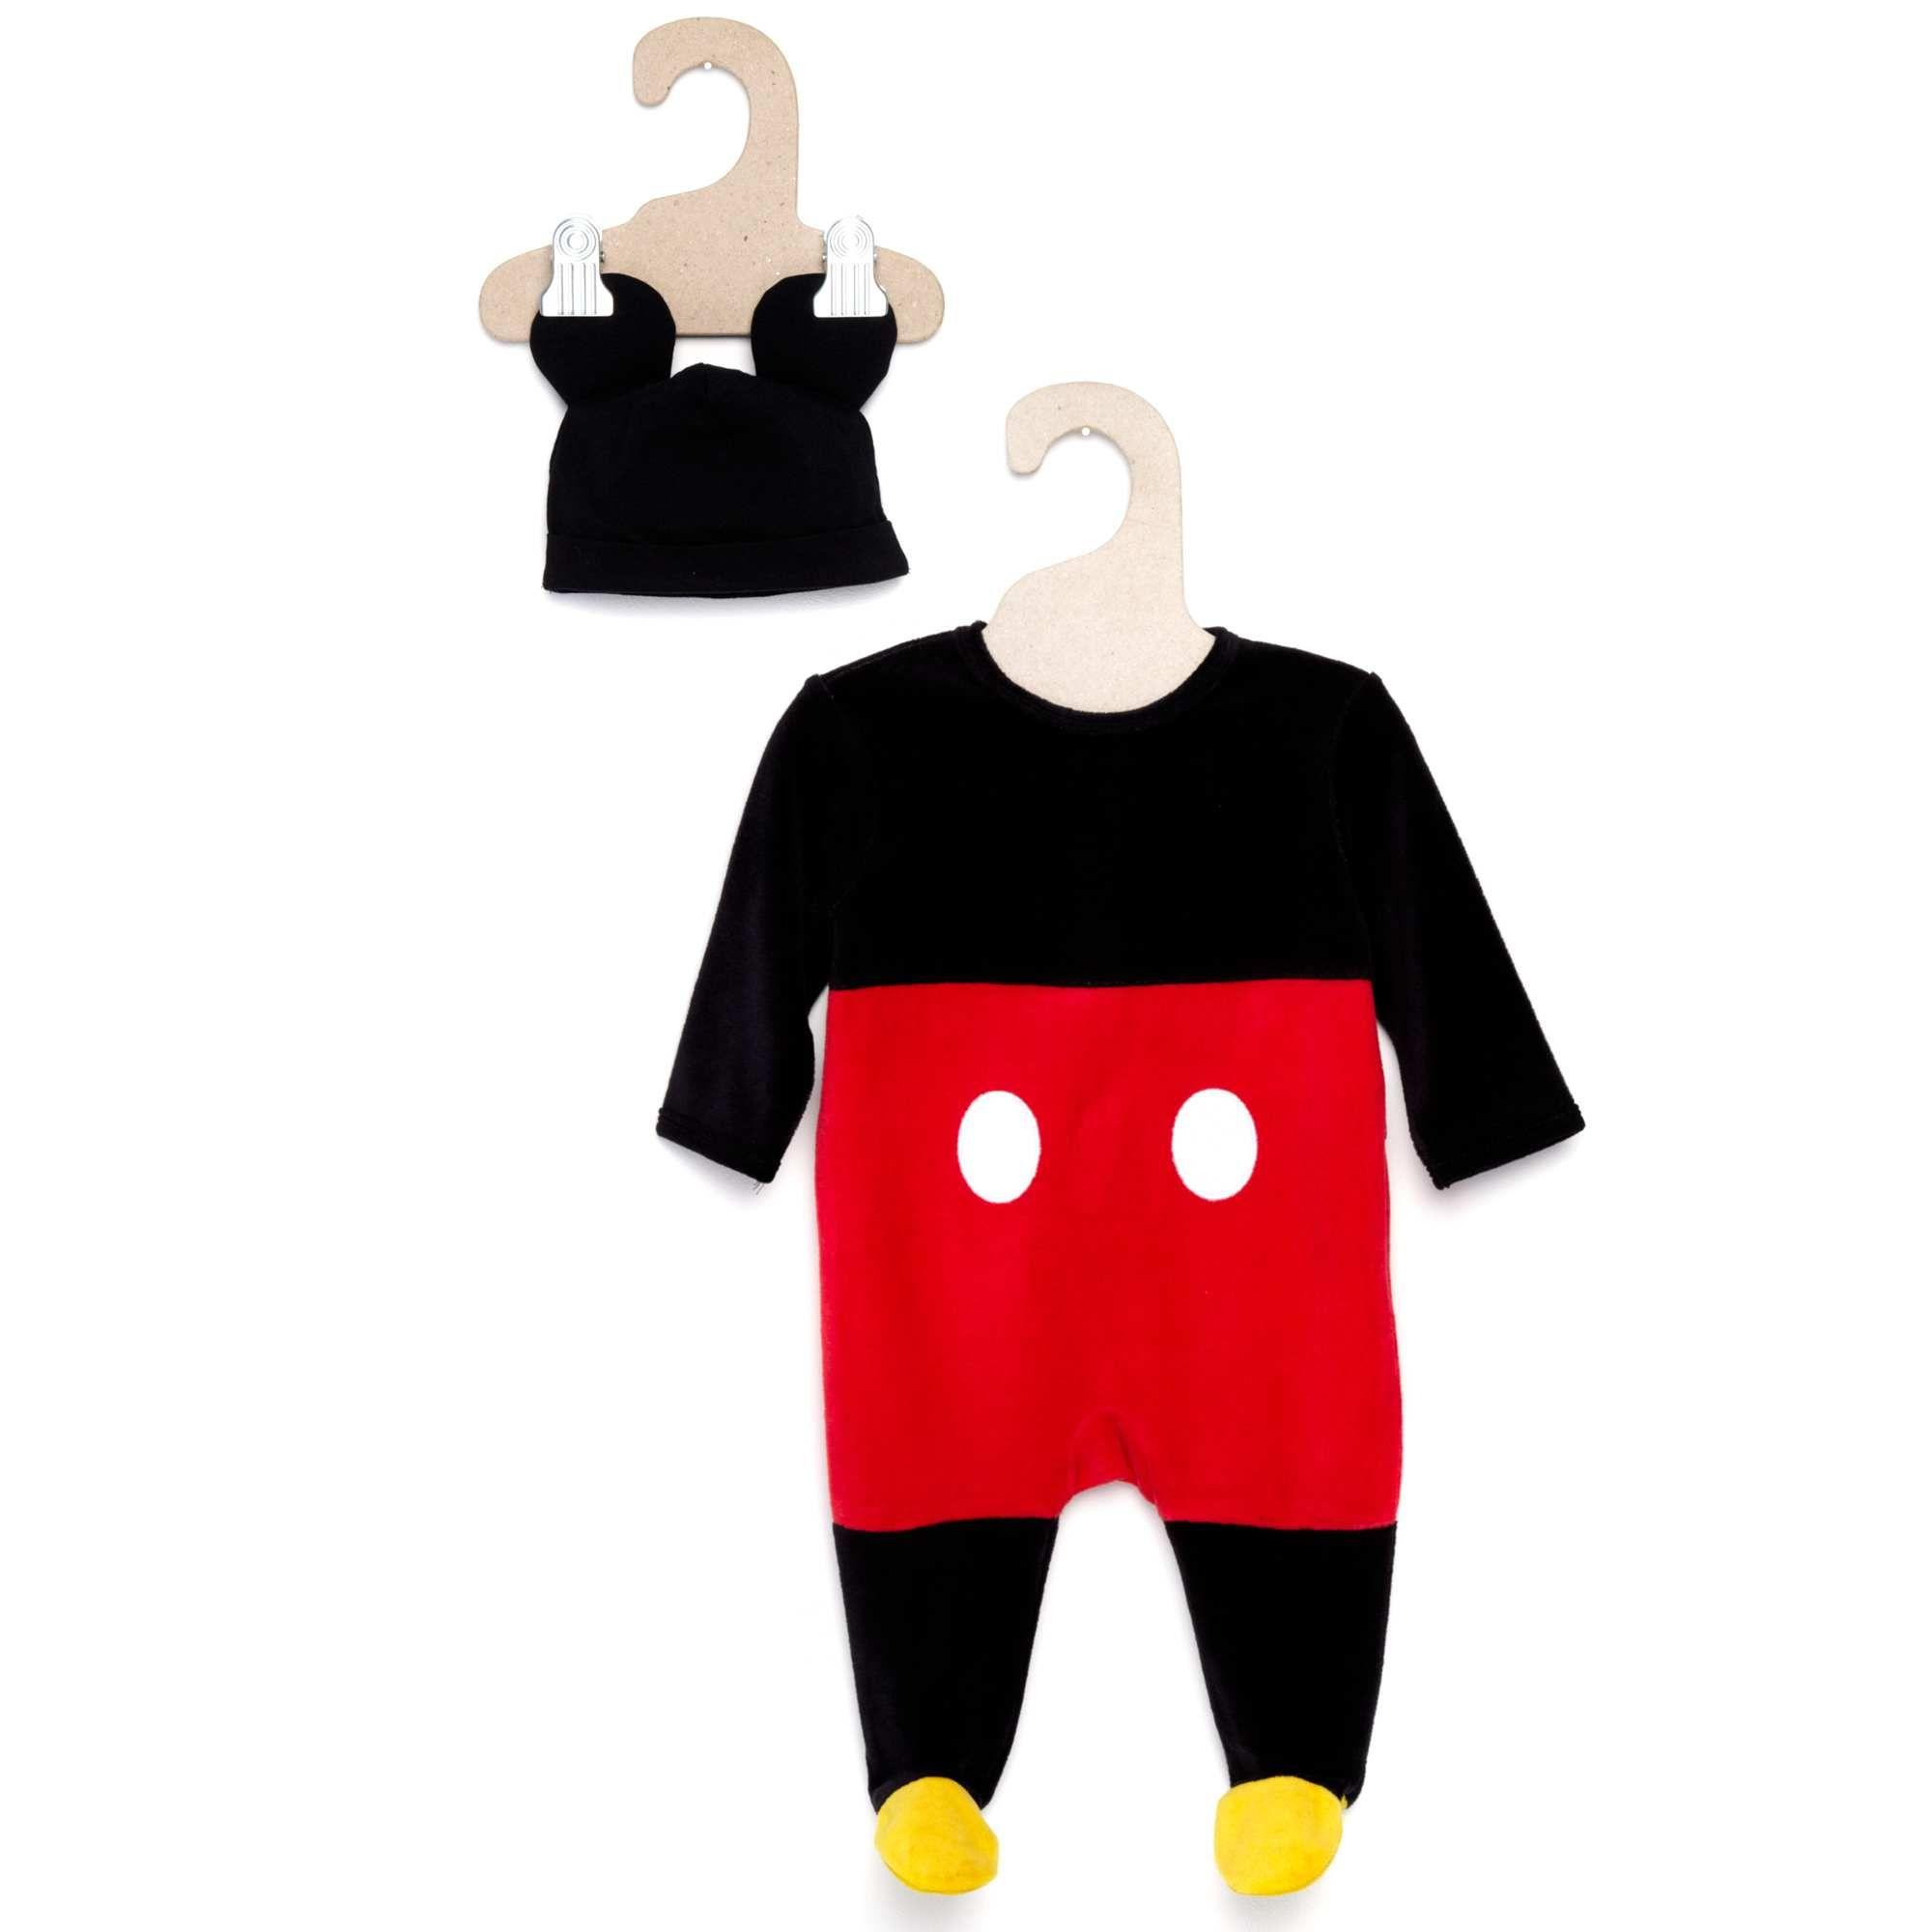 0f3b27a4db5a Dors-bien déguisement  Mickey  en velours + son bonnet Bébé garçon - Kiabi  - 14,99€